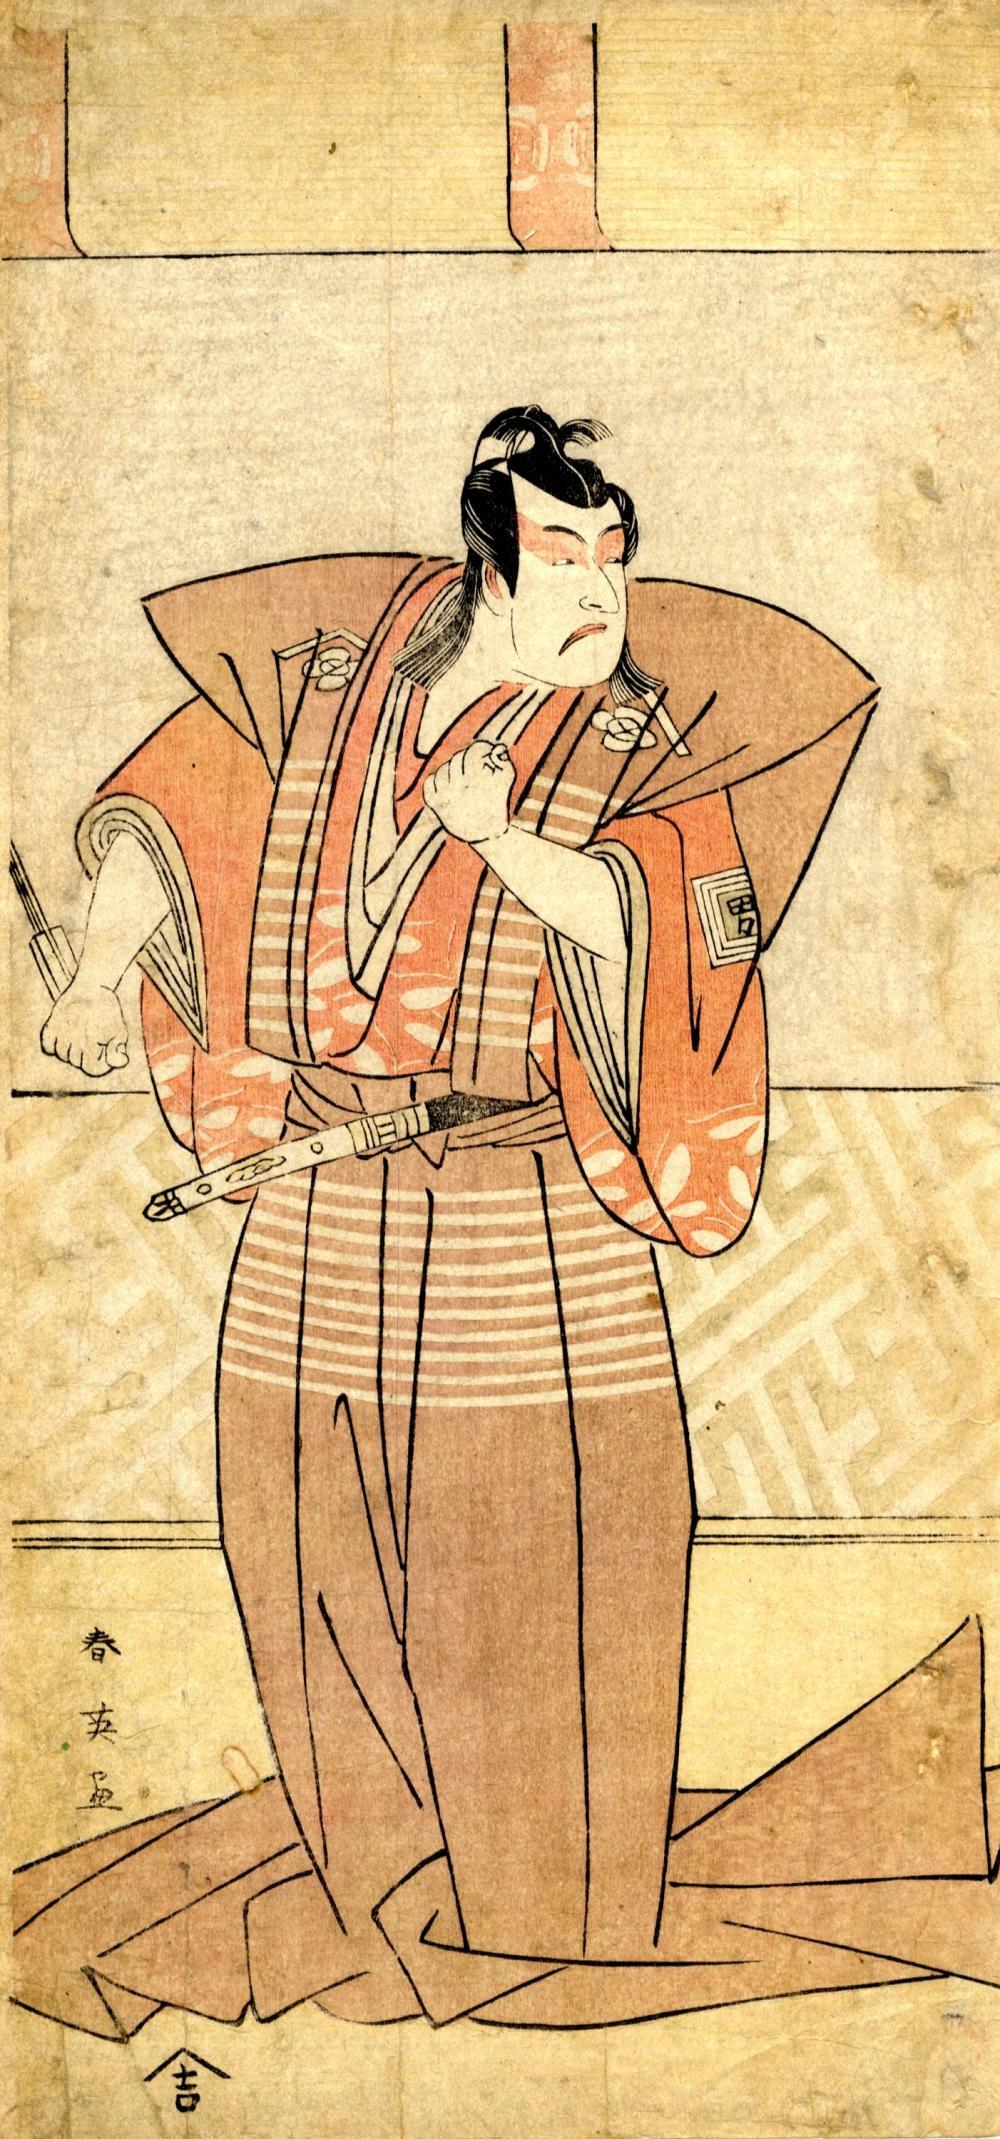 Japanese Woodblock Print, Shunei, Katsukawa tätig 1762-1819 Kabukie (Hosoban, ca. 1790)